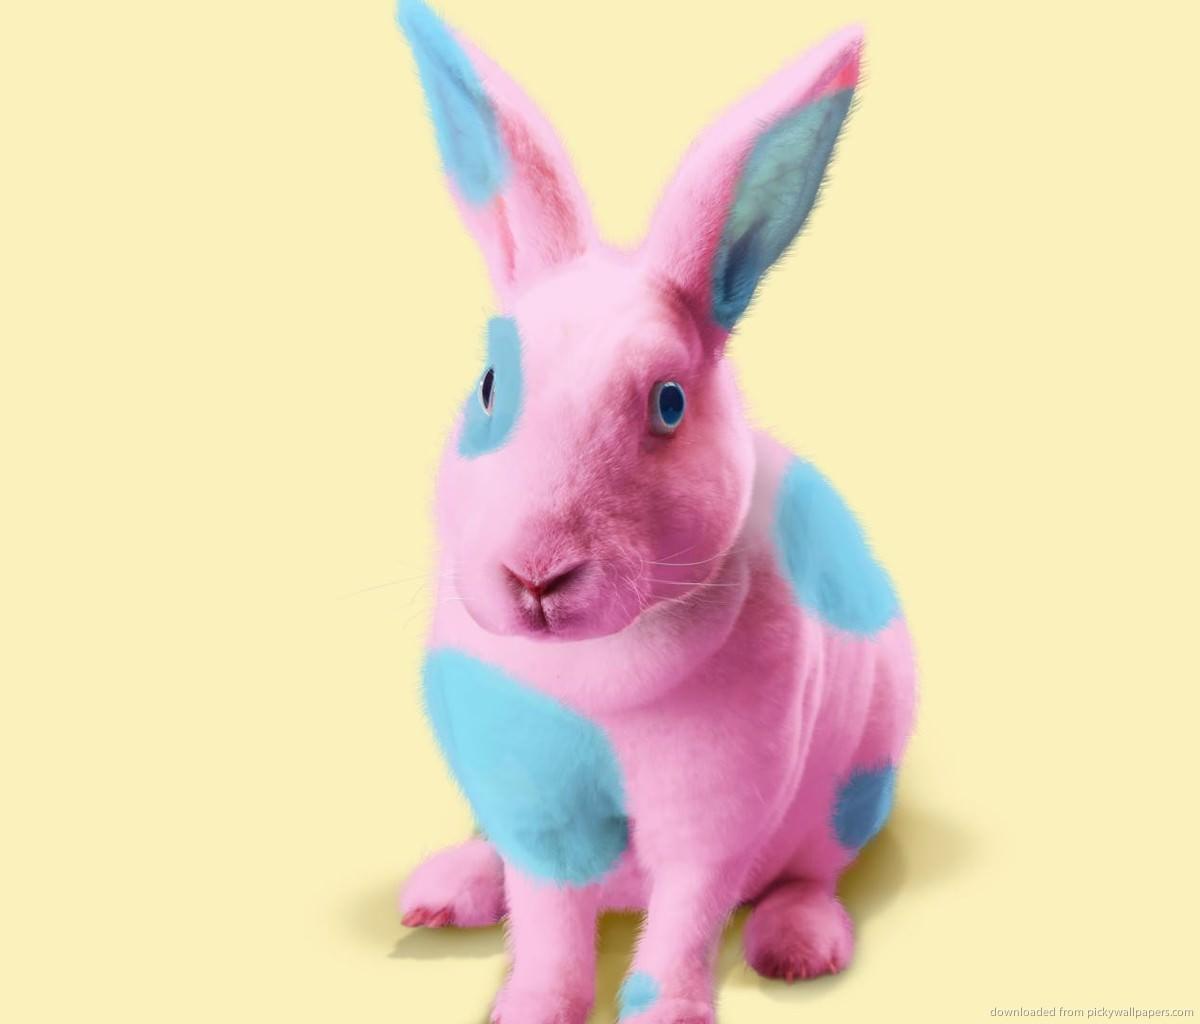 bunny 2016 easter 4k - photo #40